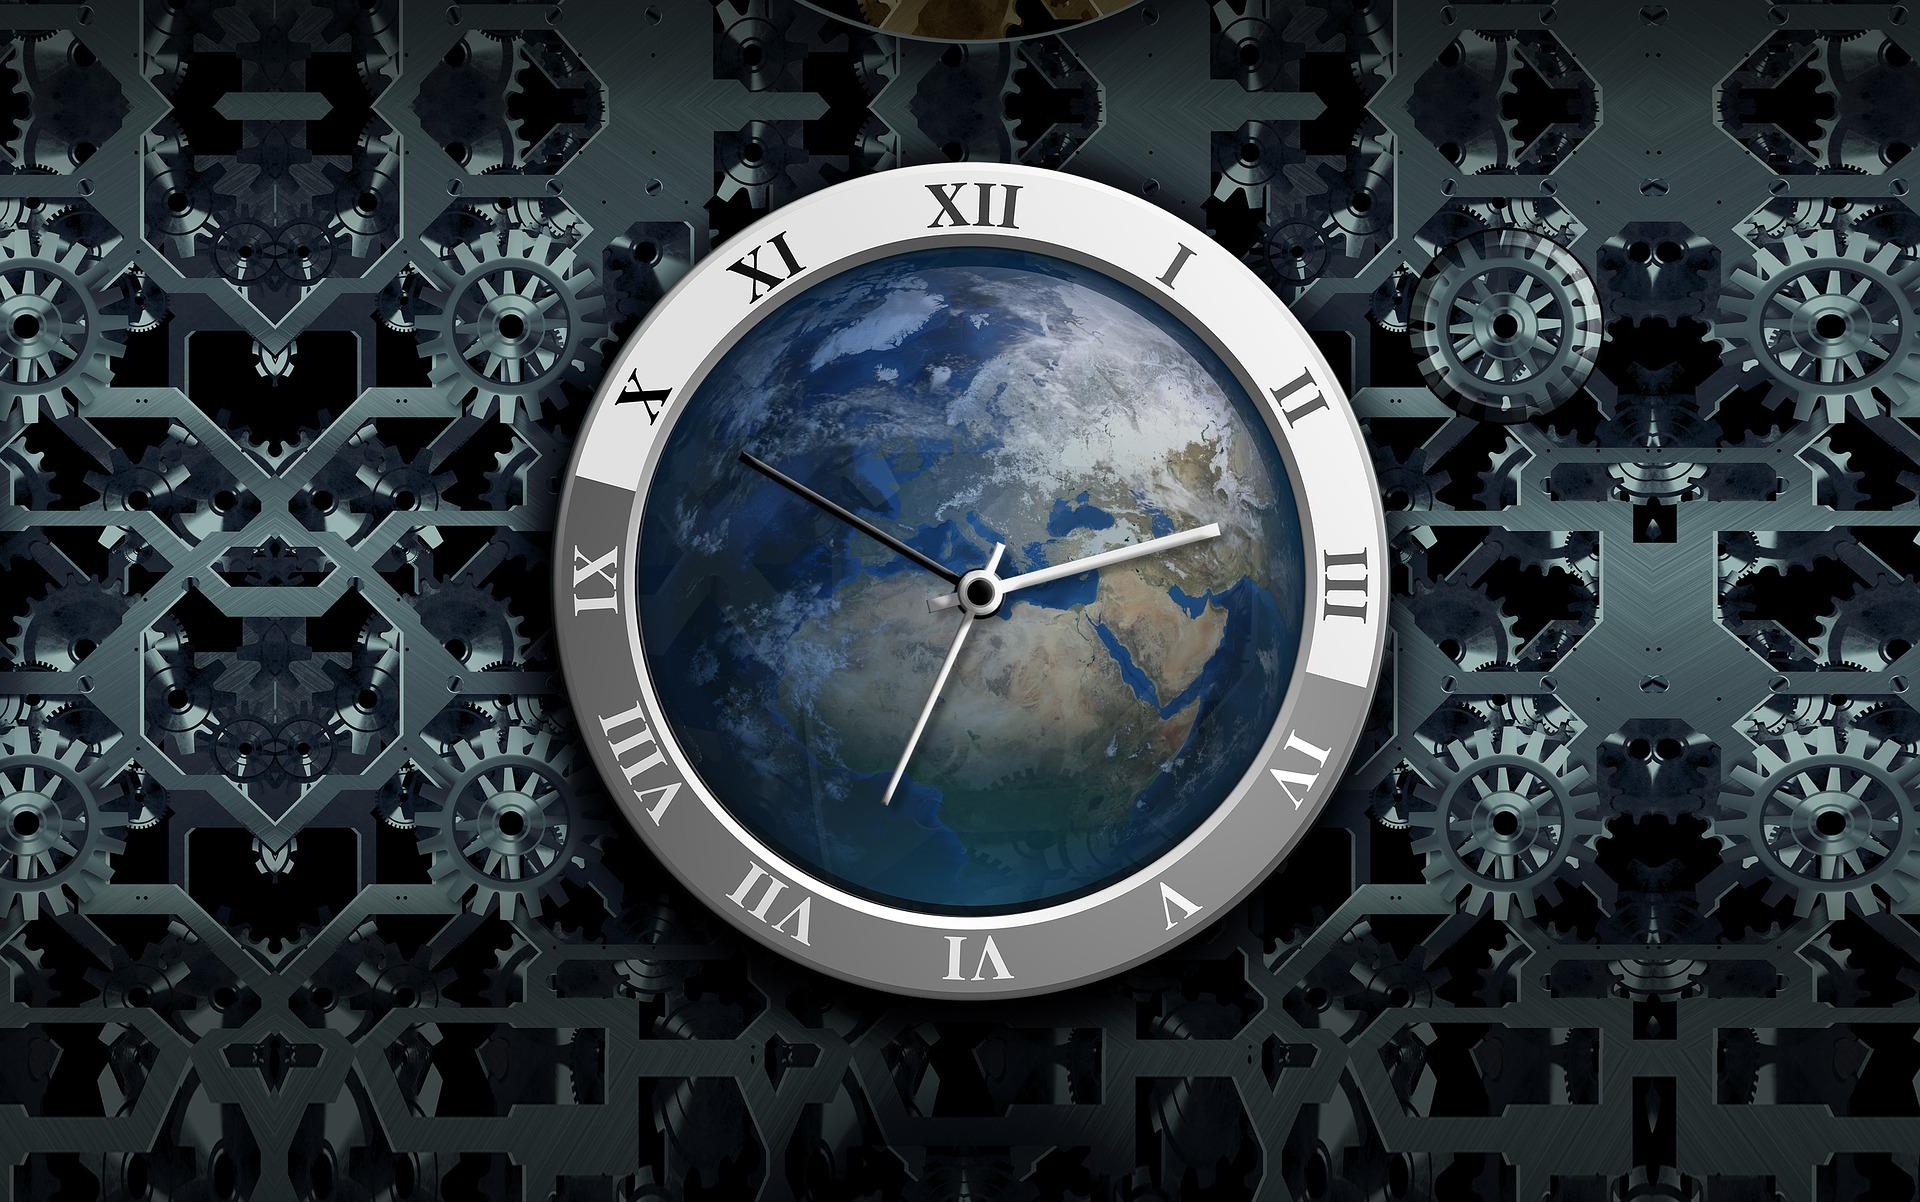 ora legale orologio terra ambiente